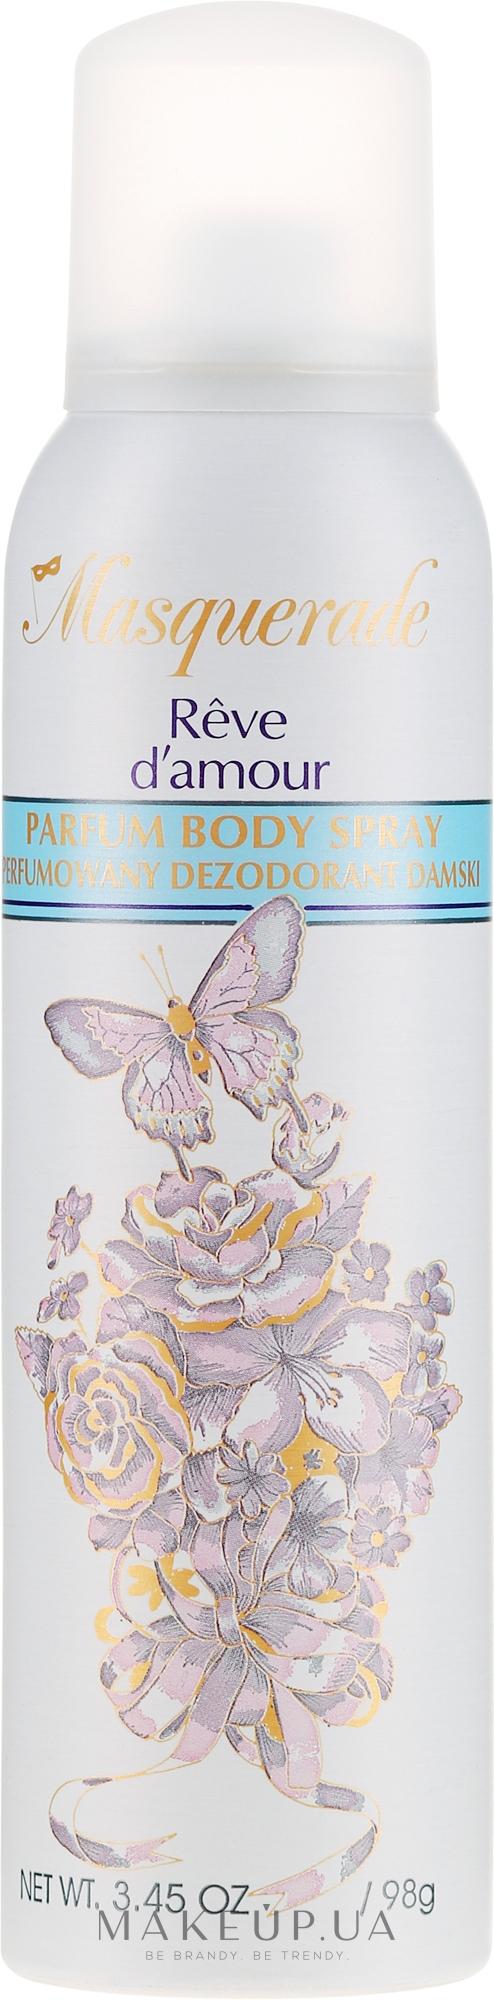 Дезодорант - Masquerade Reve d'Amour Deo Spray — фото 150ml